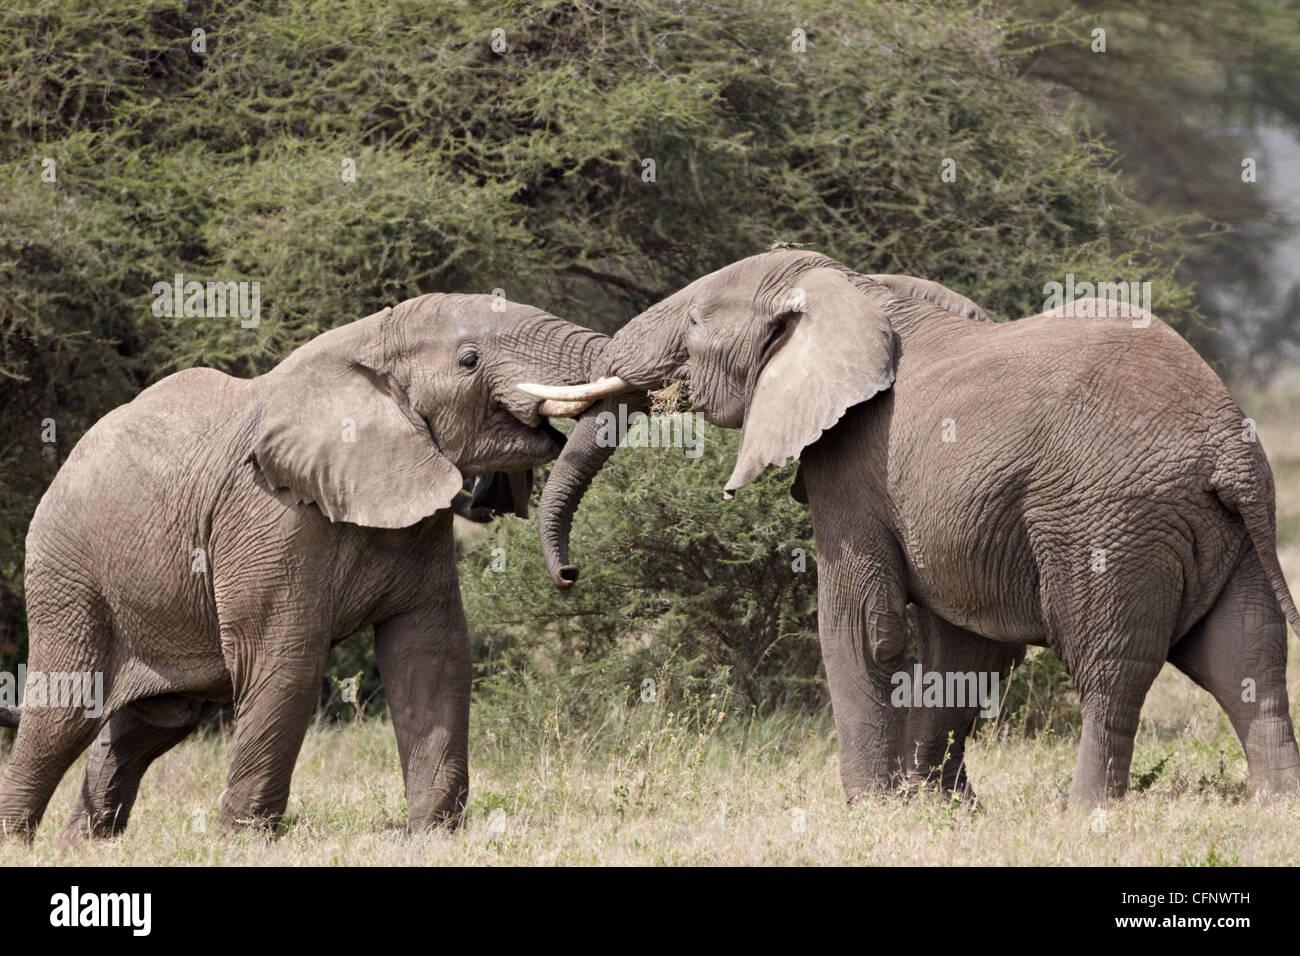 Due elefante africano (Loxodonta africana) sparring, Serengeti National Park, Tanzania, Africa orientale, Africa Immagini Stock